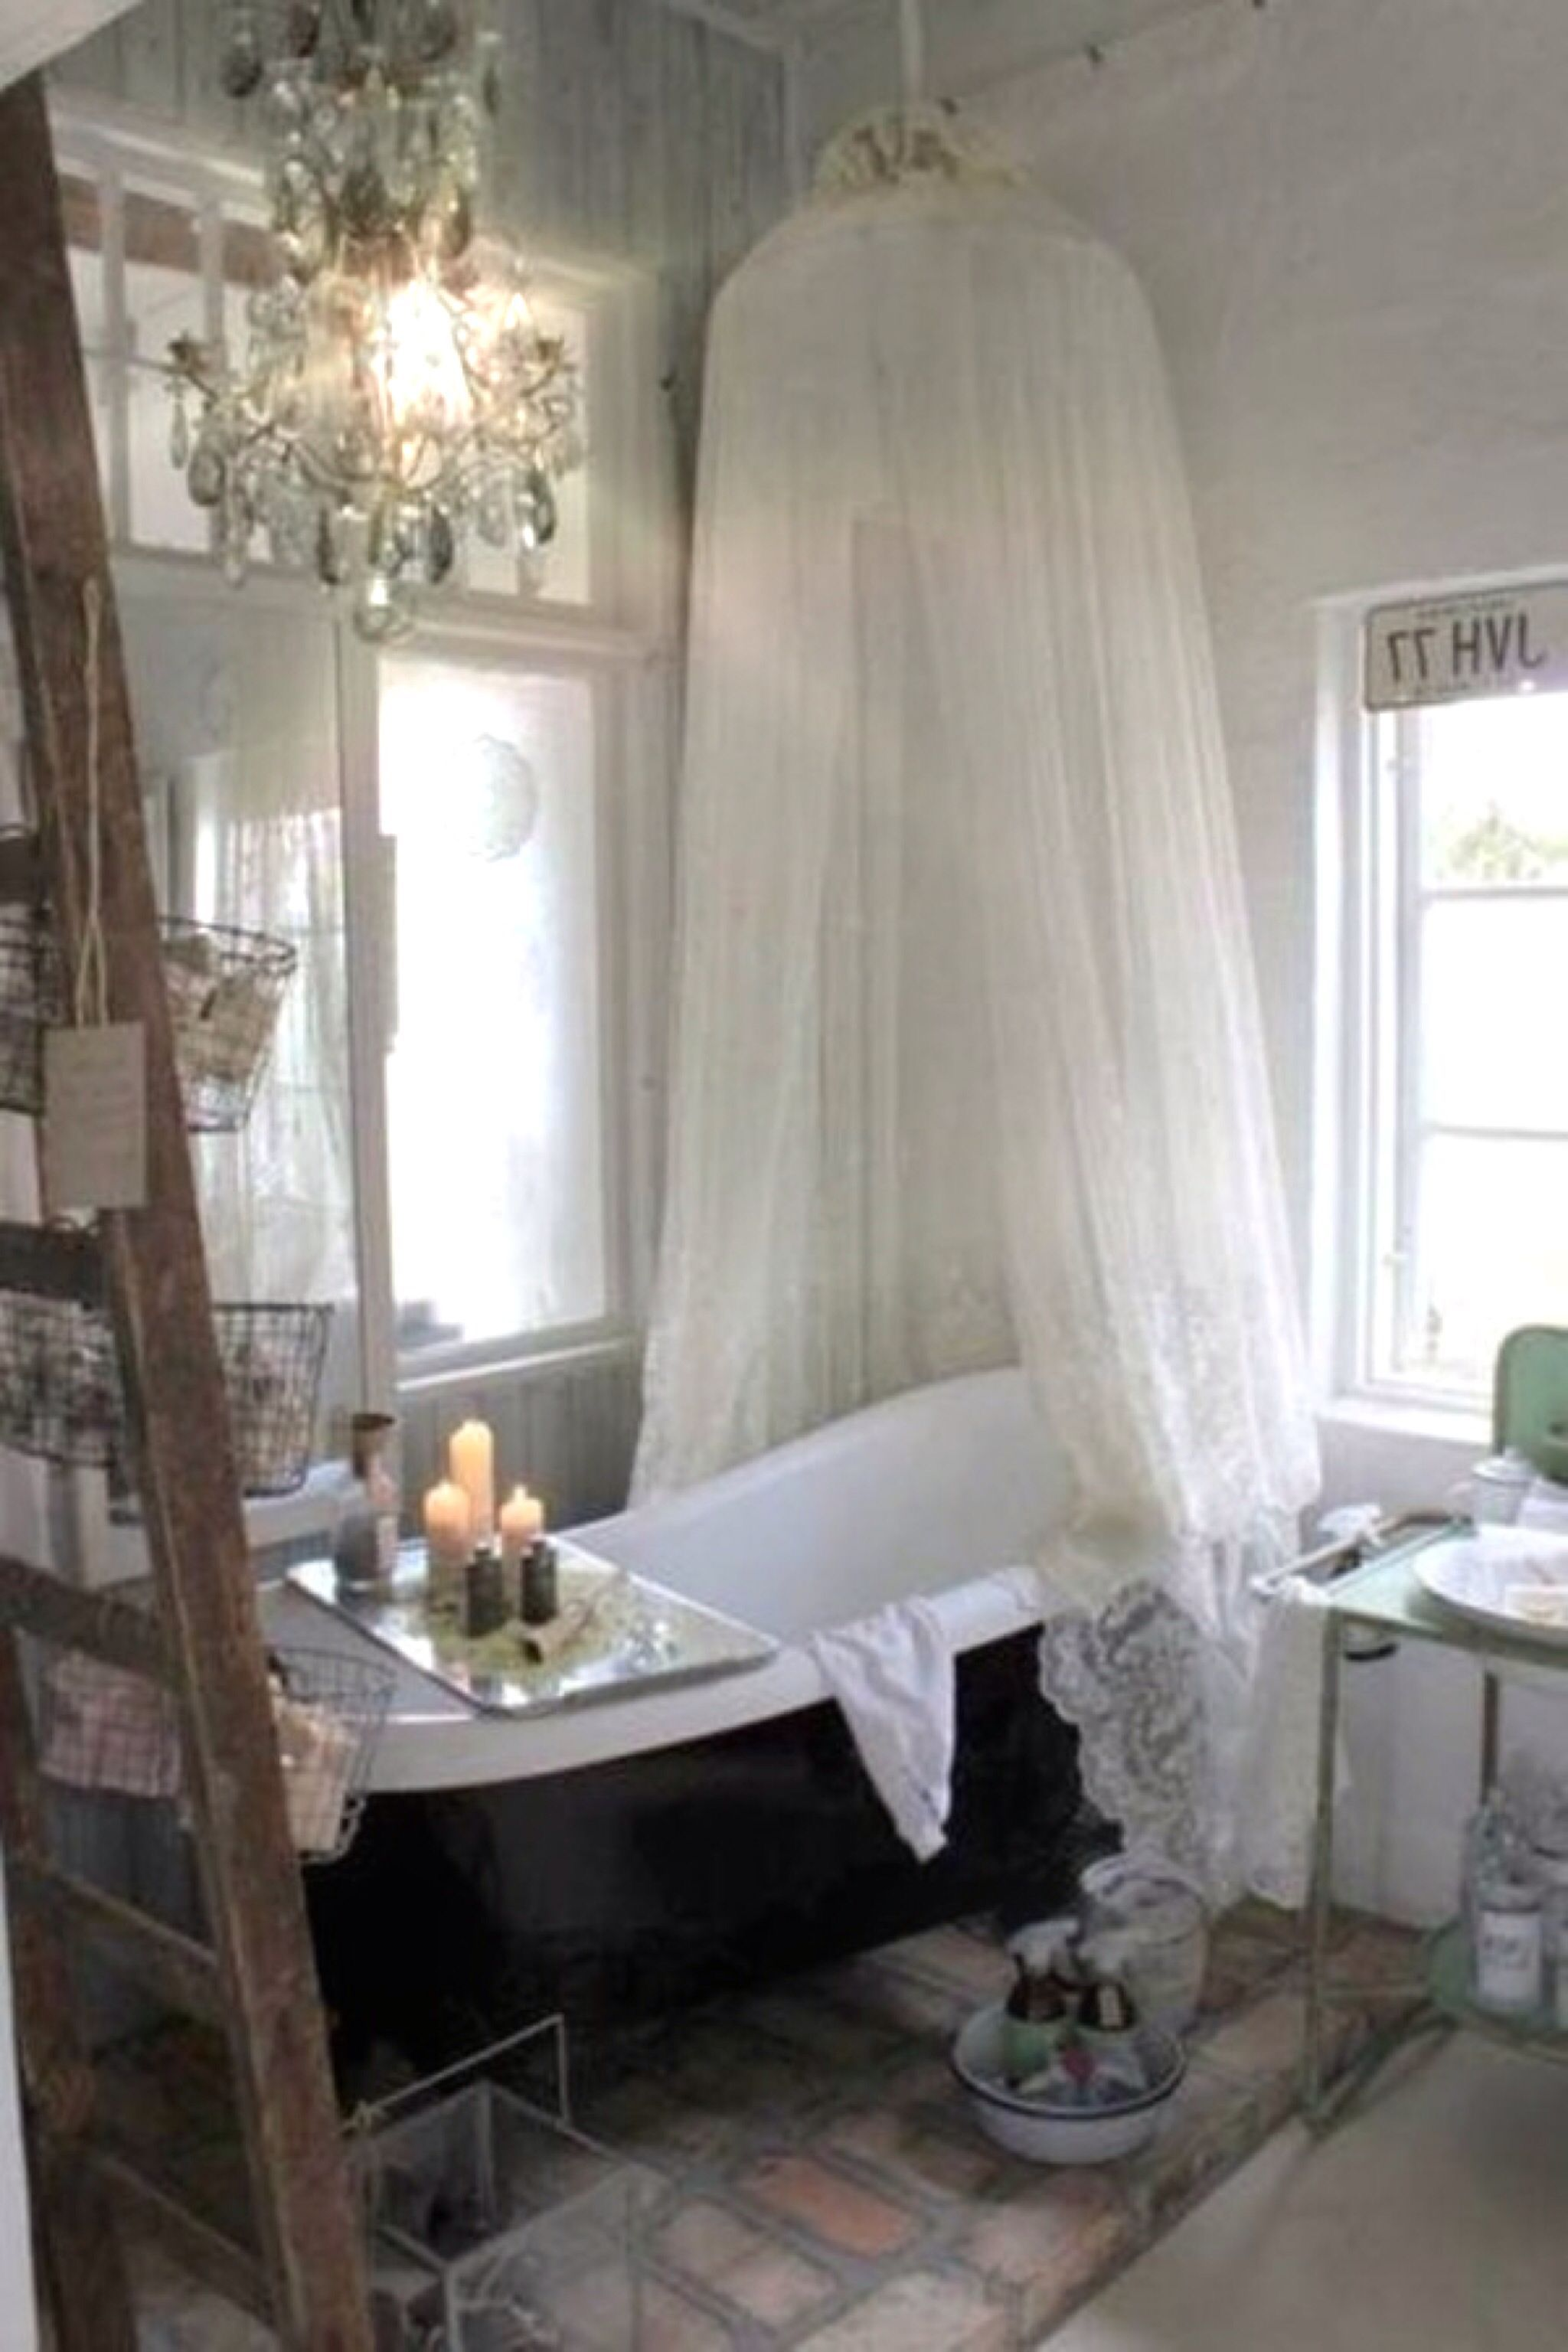 Badezimmer ideen mit wanne shabby chic luxury netting over outdoor tub more  bad sauna